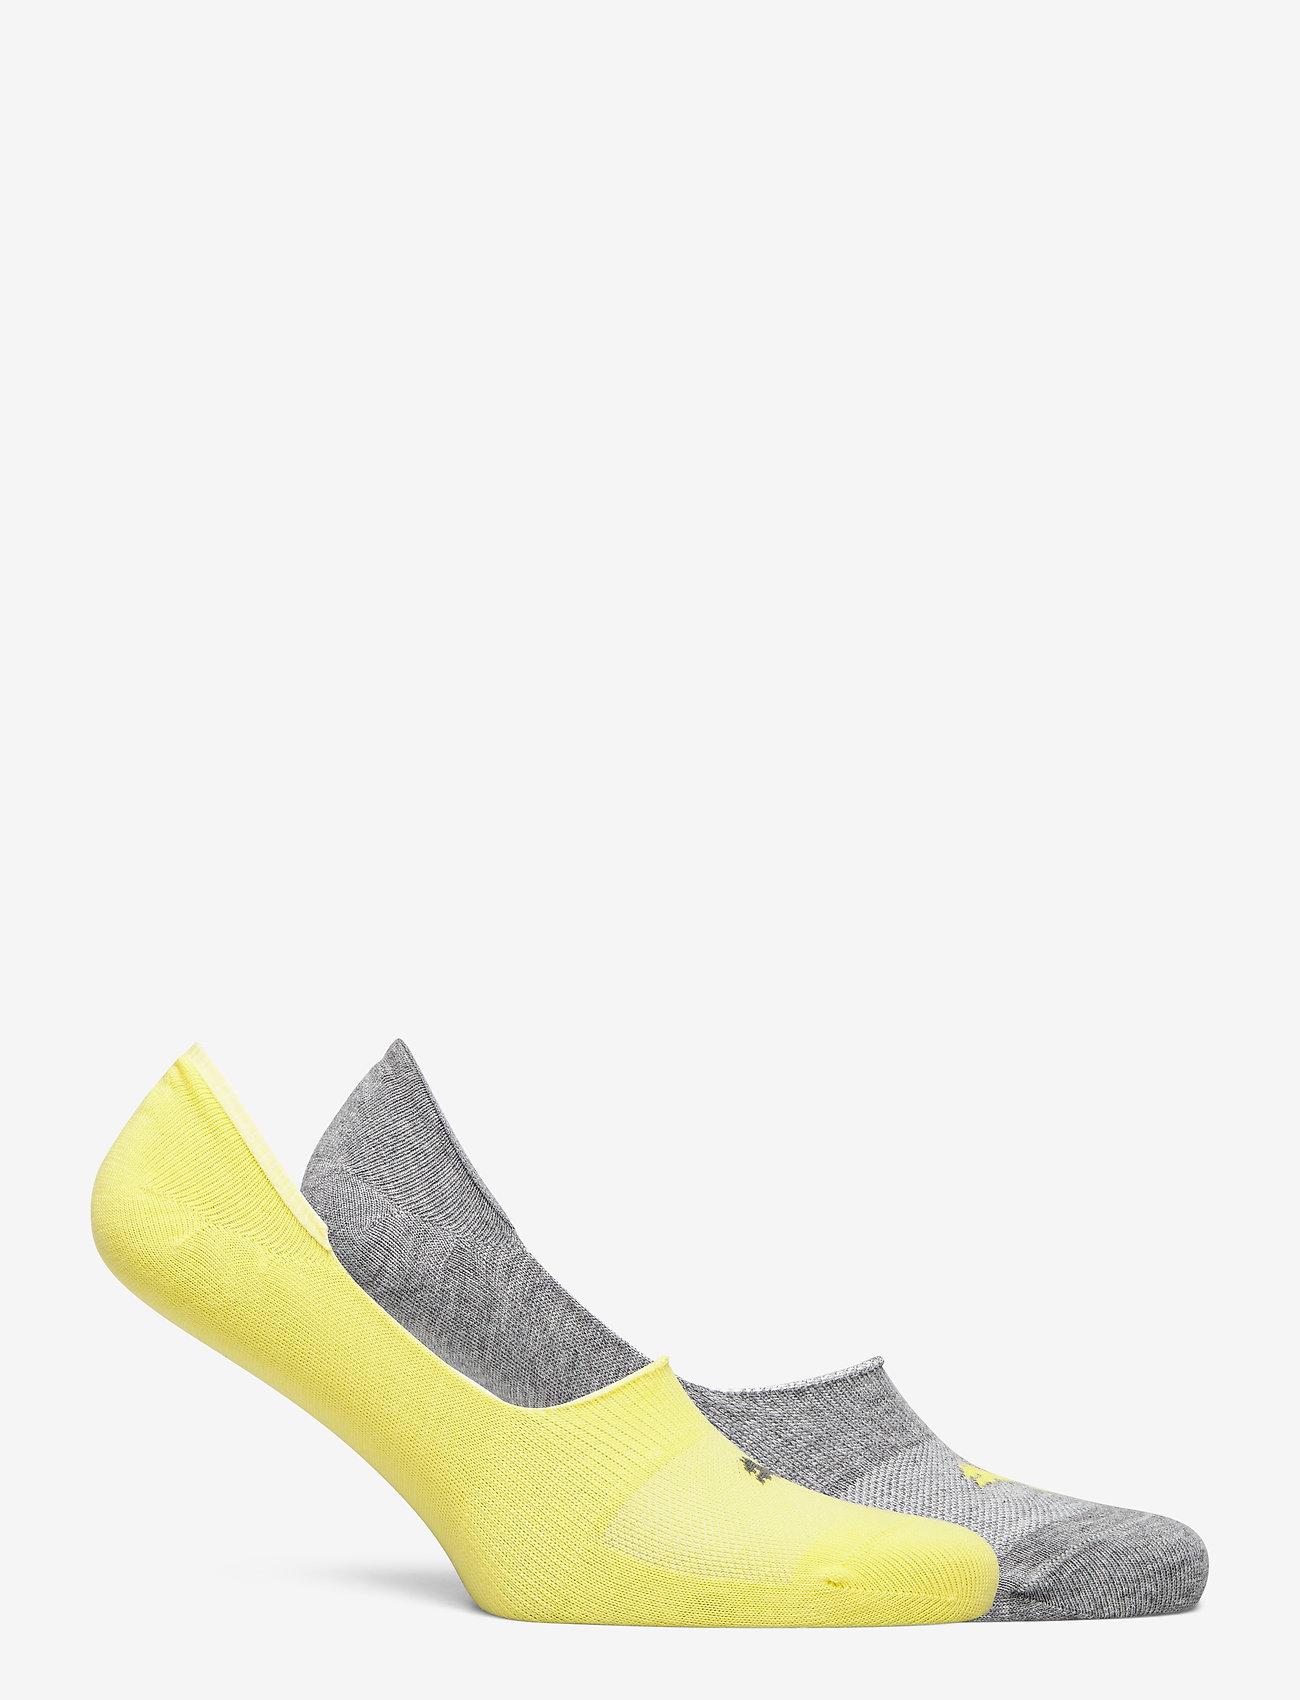 PUMA - PUMA FOOTIE 2P UNISEX - kousen - yellow - 1